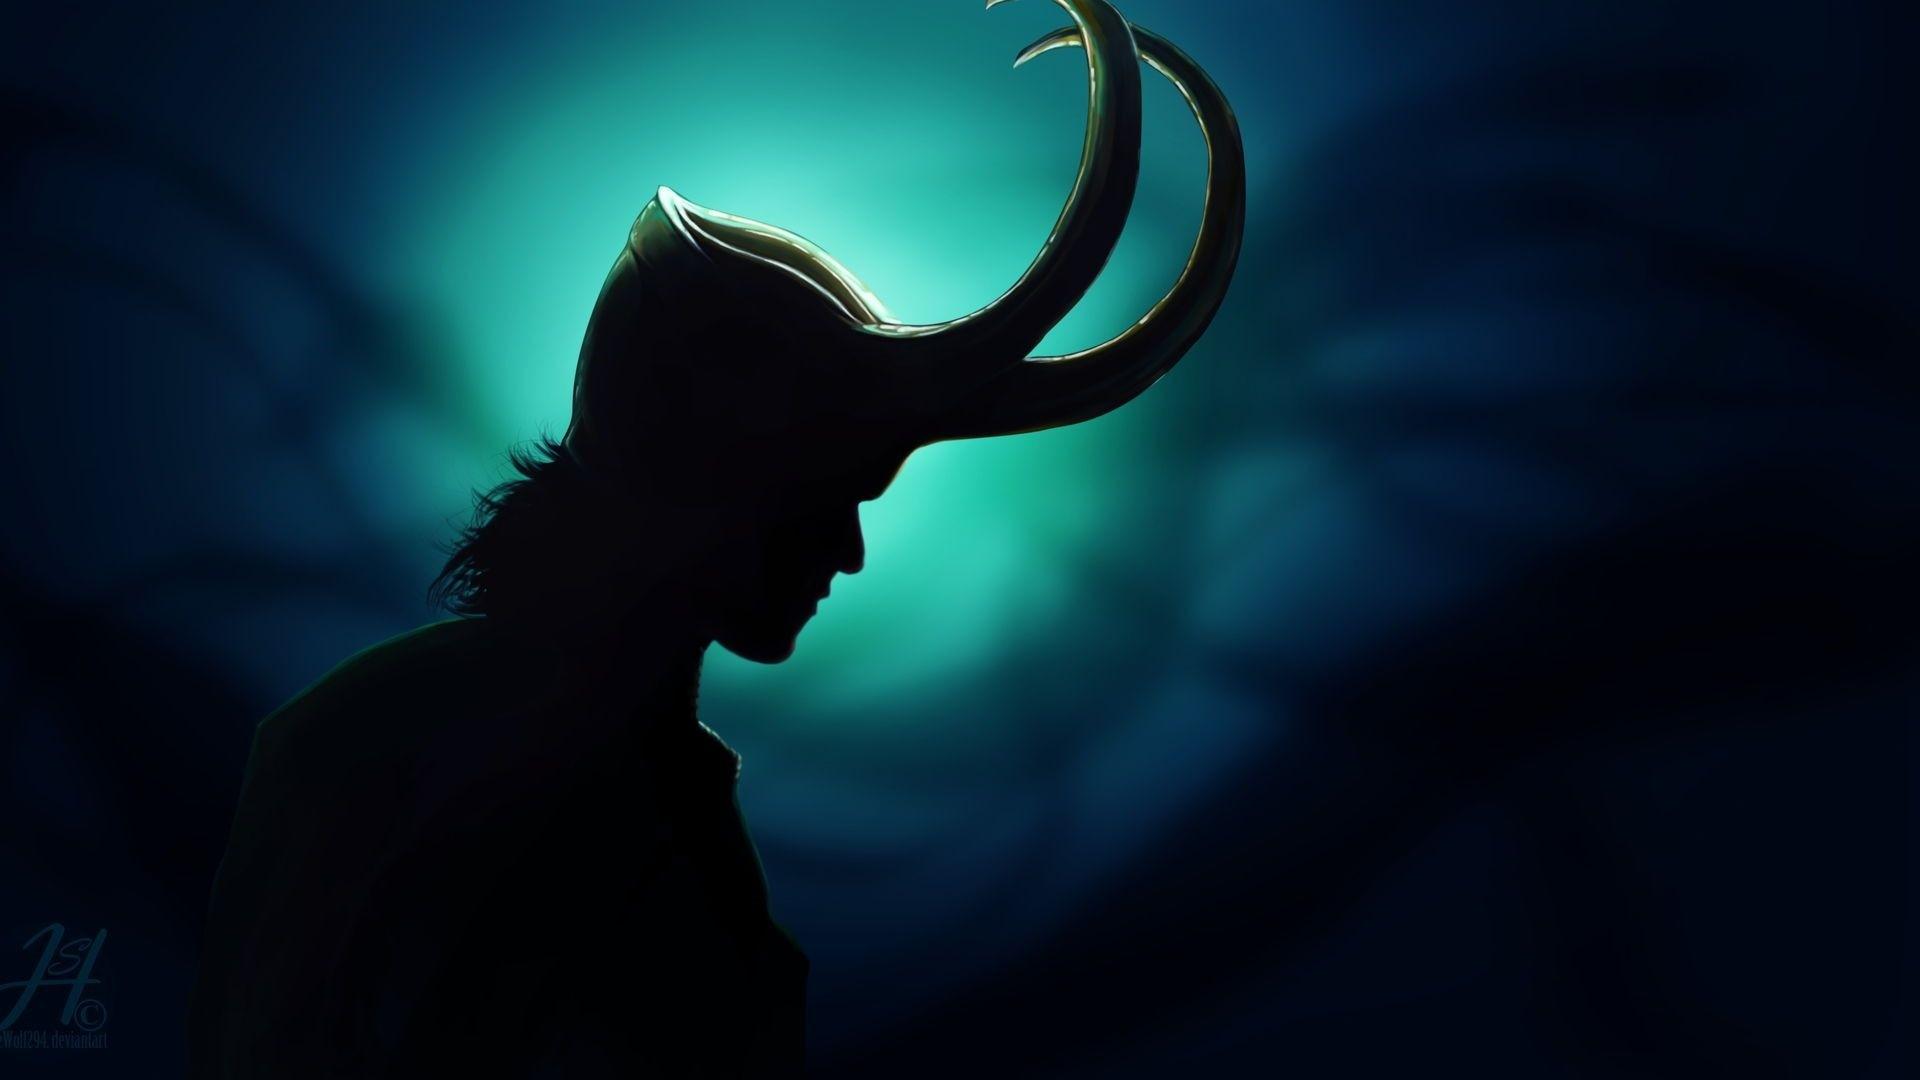 Loki hd desktop wallpaper